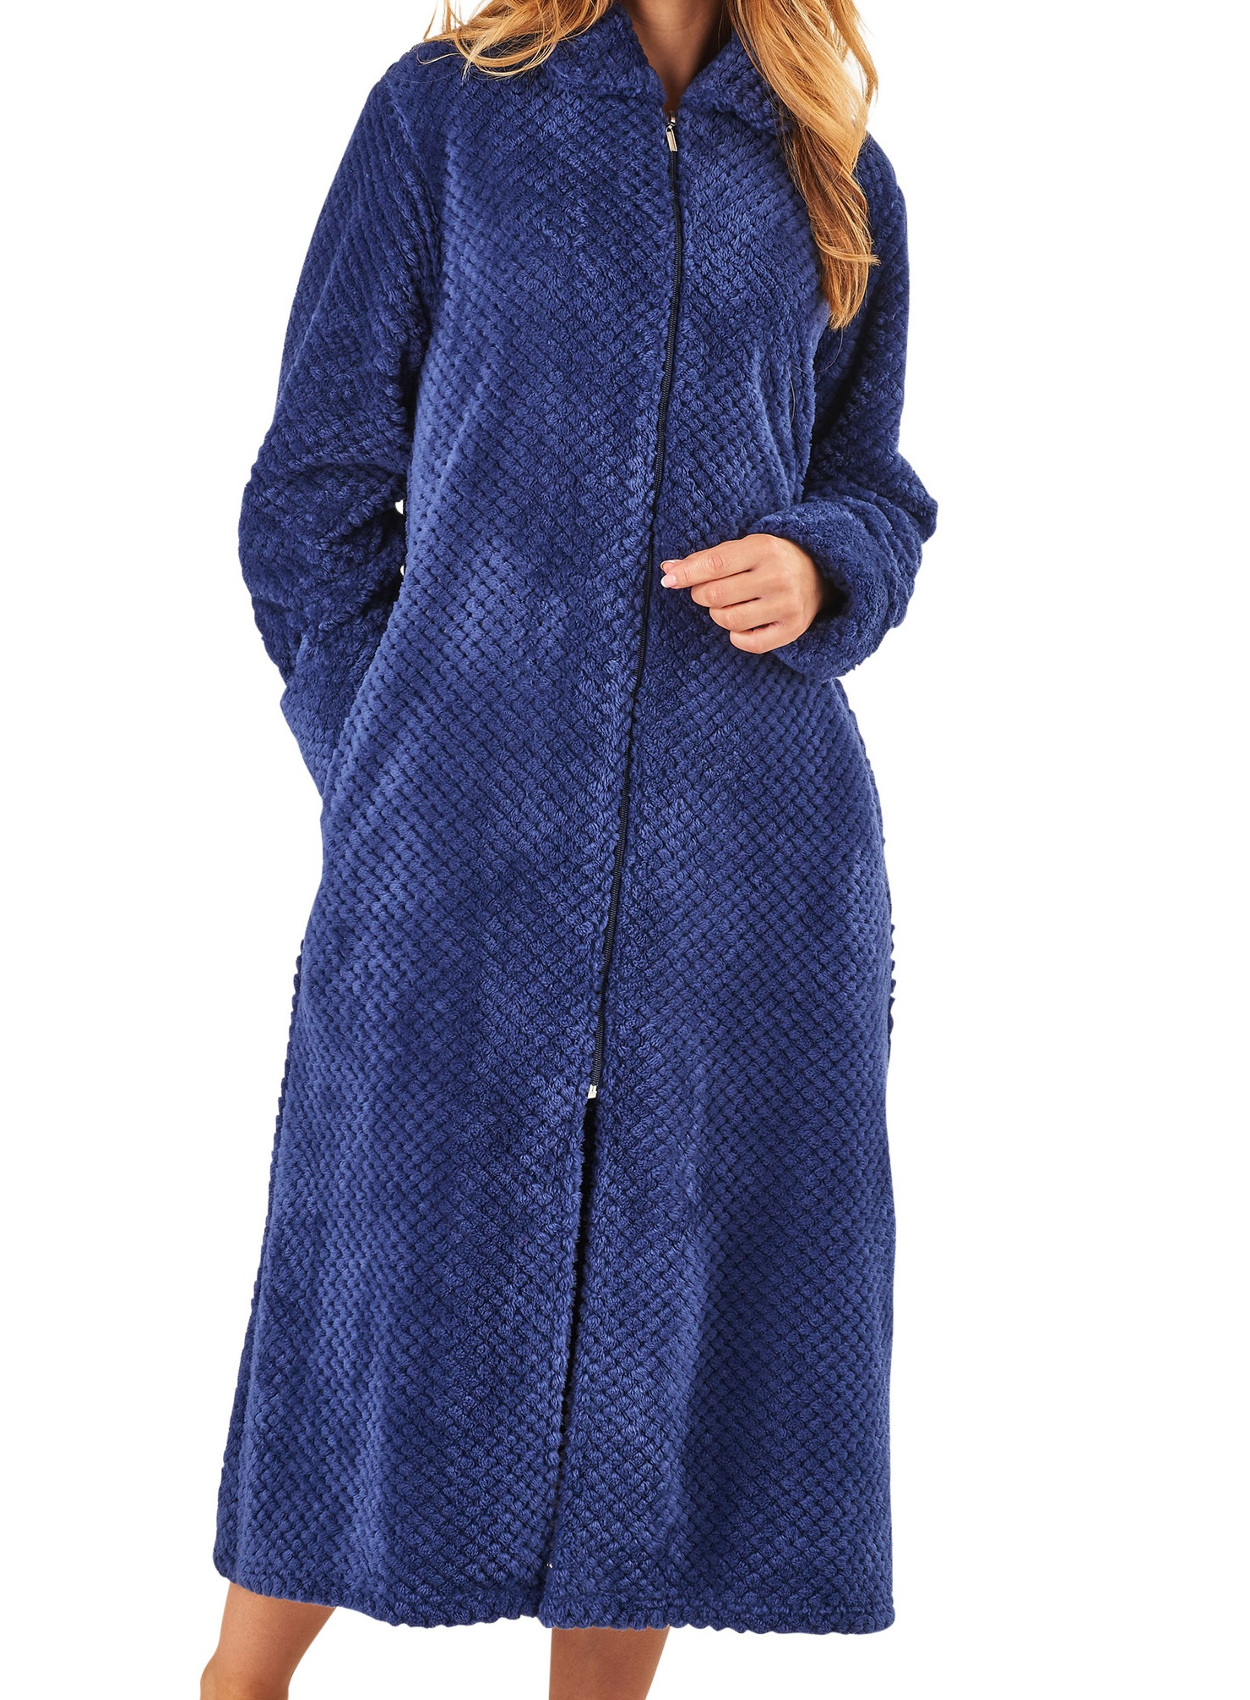 0027671be0 Dressing Gown Ladies Zip Up Soft Waffle Fleece Slenderella Nightwear Bath  Robe